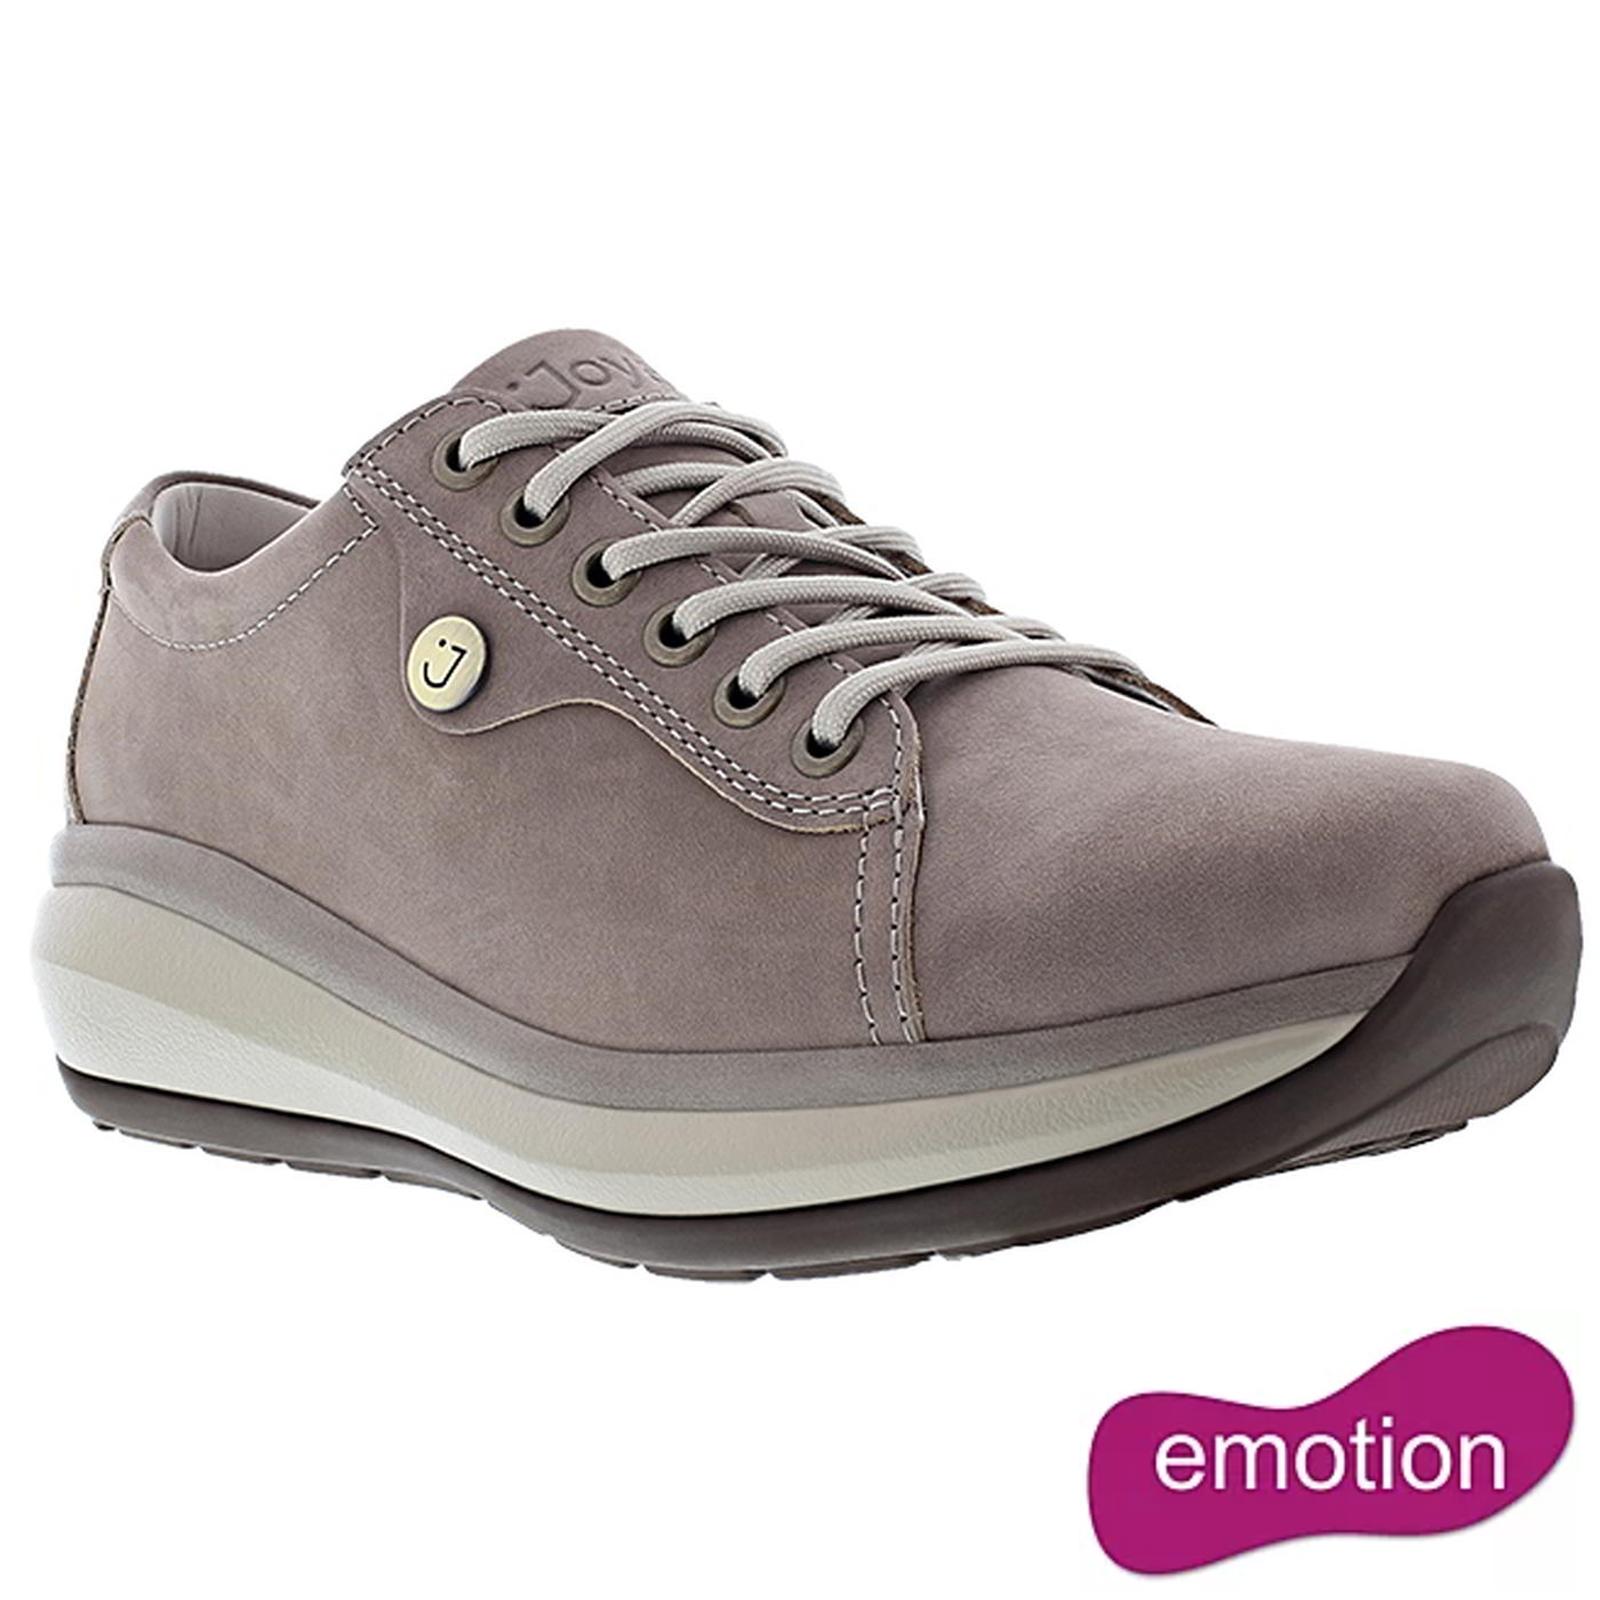 Joya Womens Paris II Leather Shoes - Grey